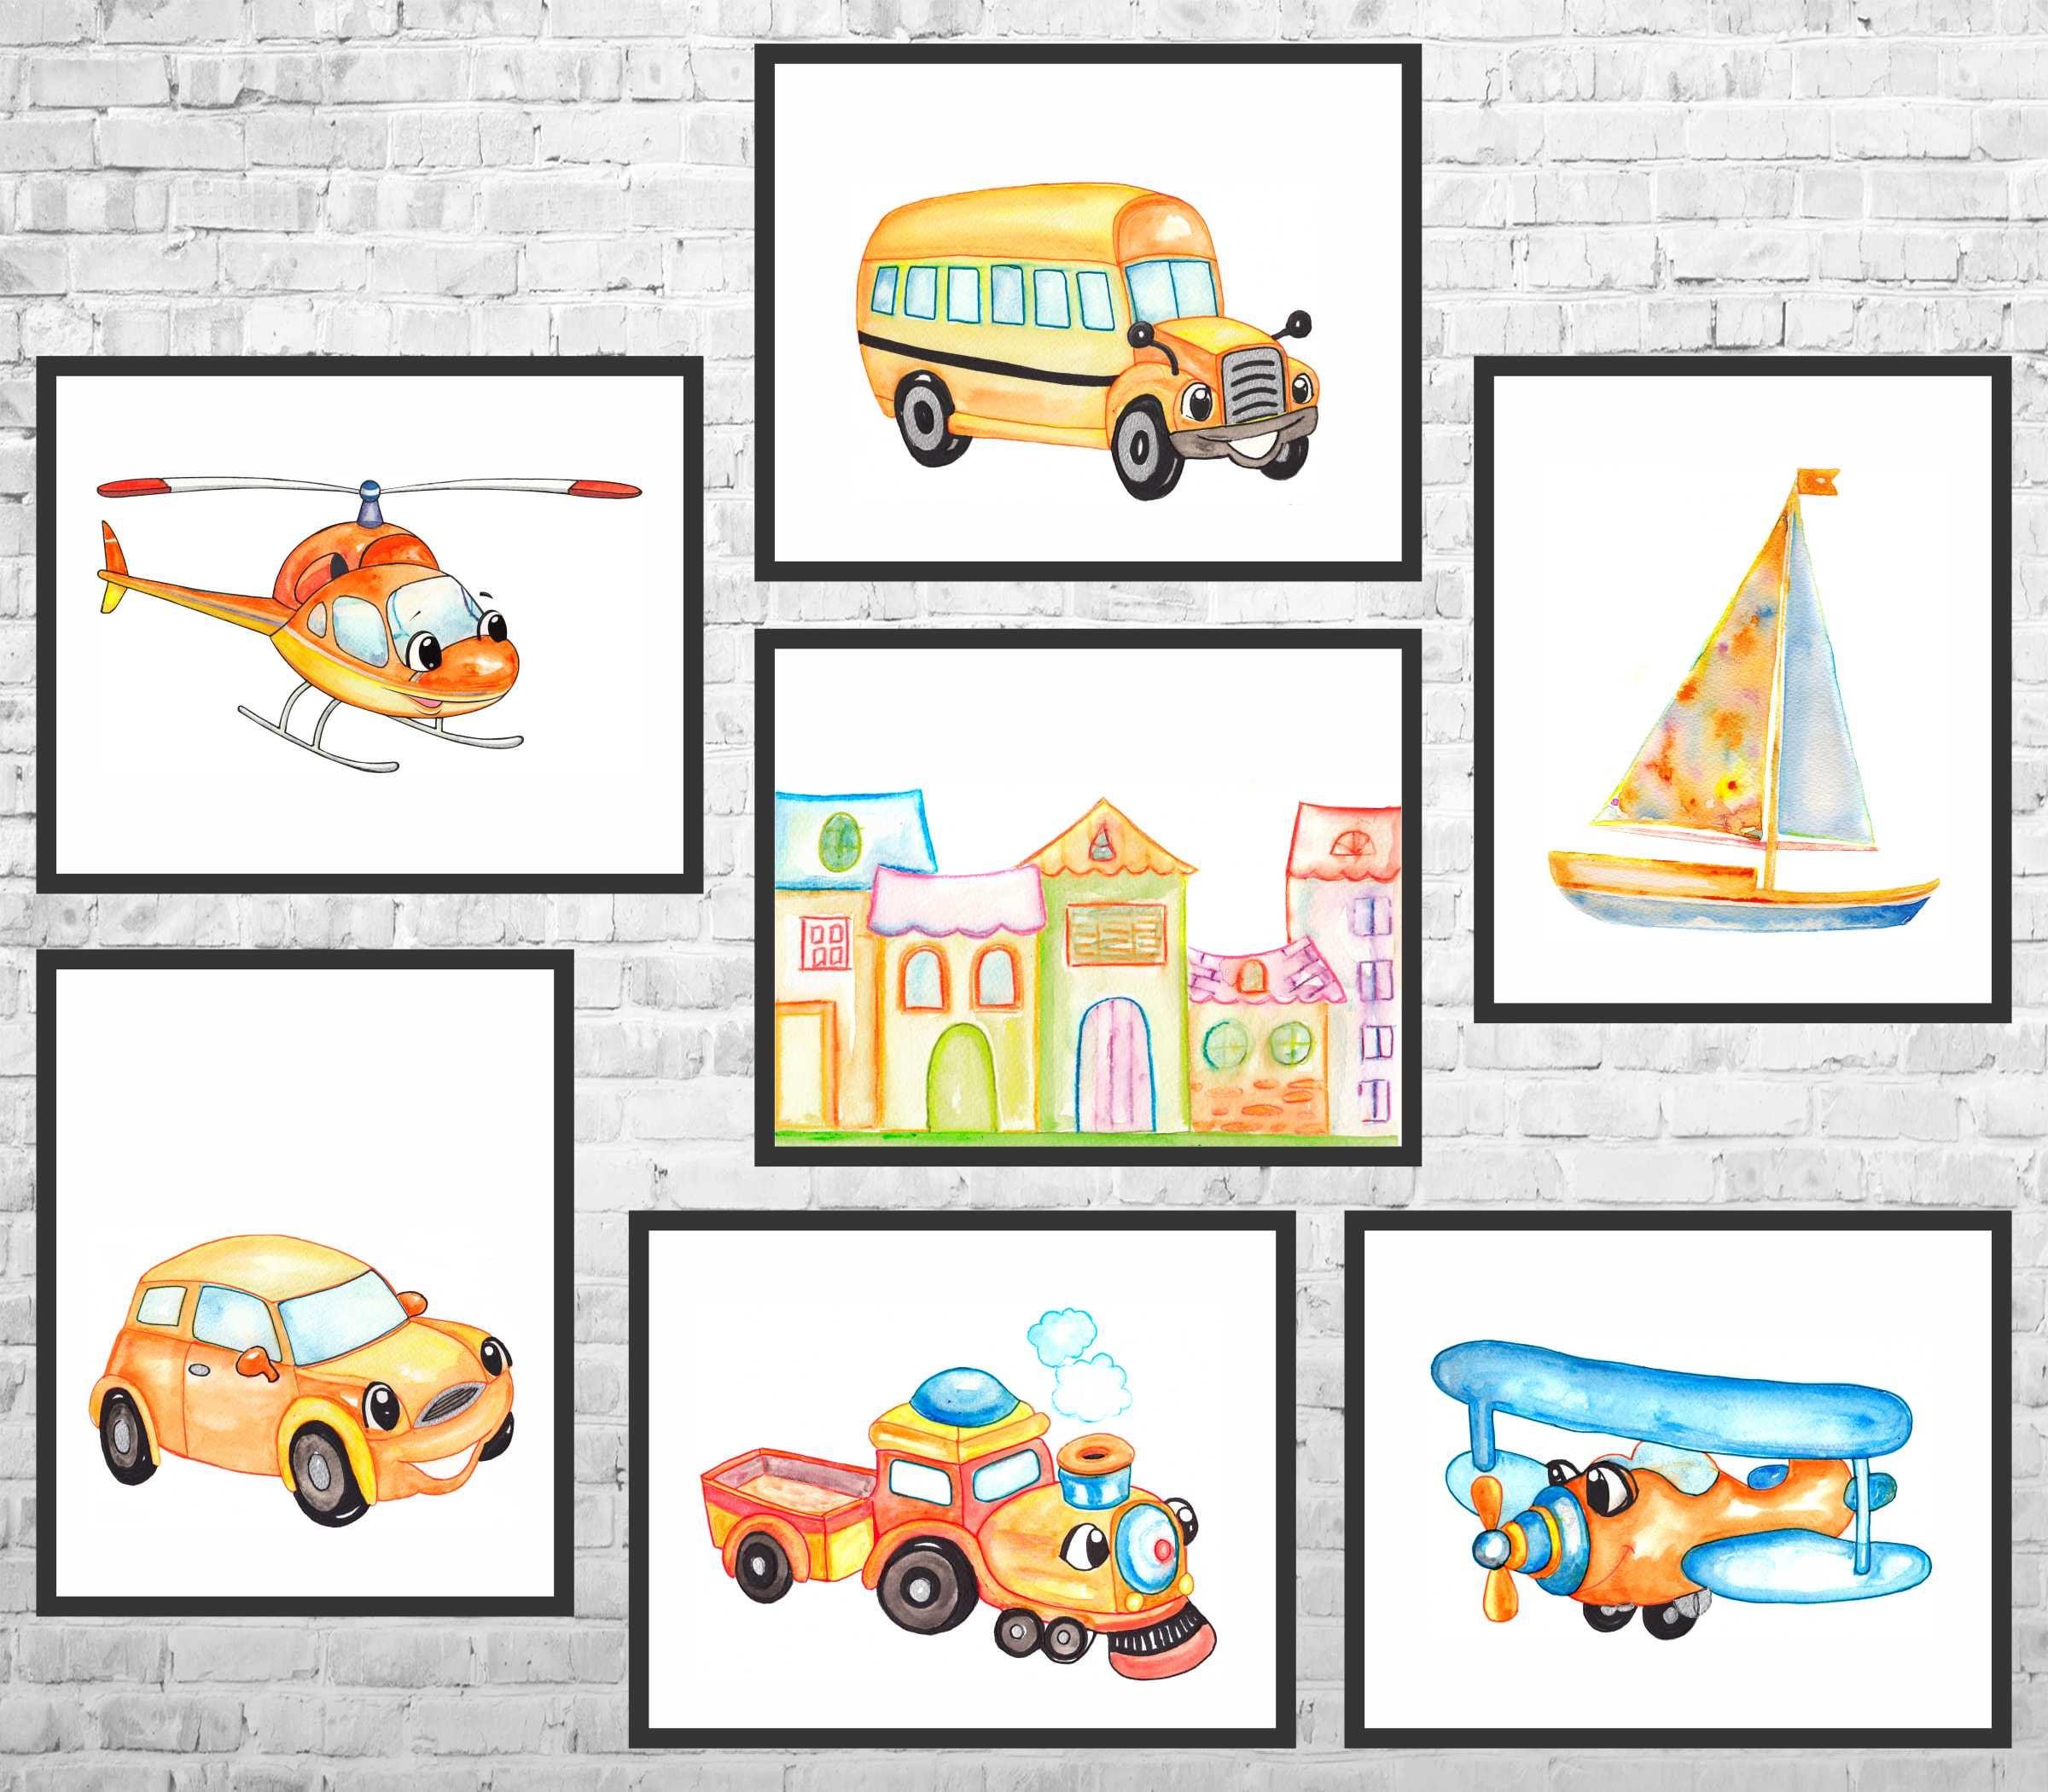 Airplane Transportation Nursery Wall Art Set Helicopter Car Set of 5 Nursery Prints Truck and Balloon Art Nursery Printable Wall Art